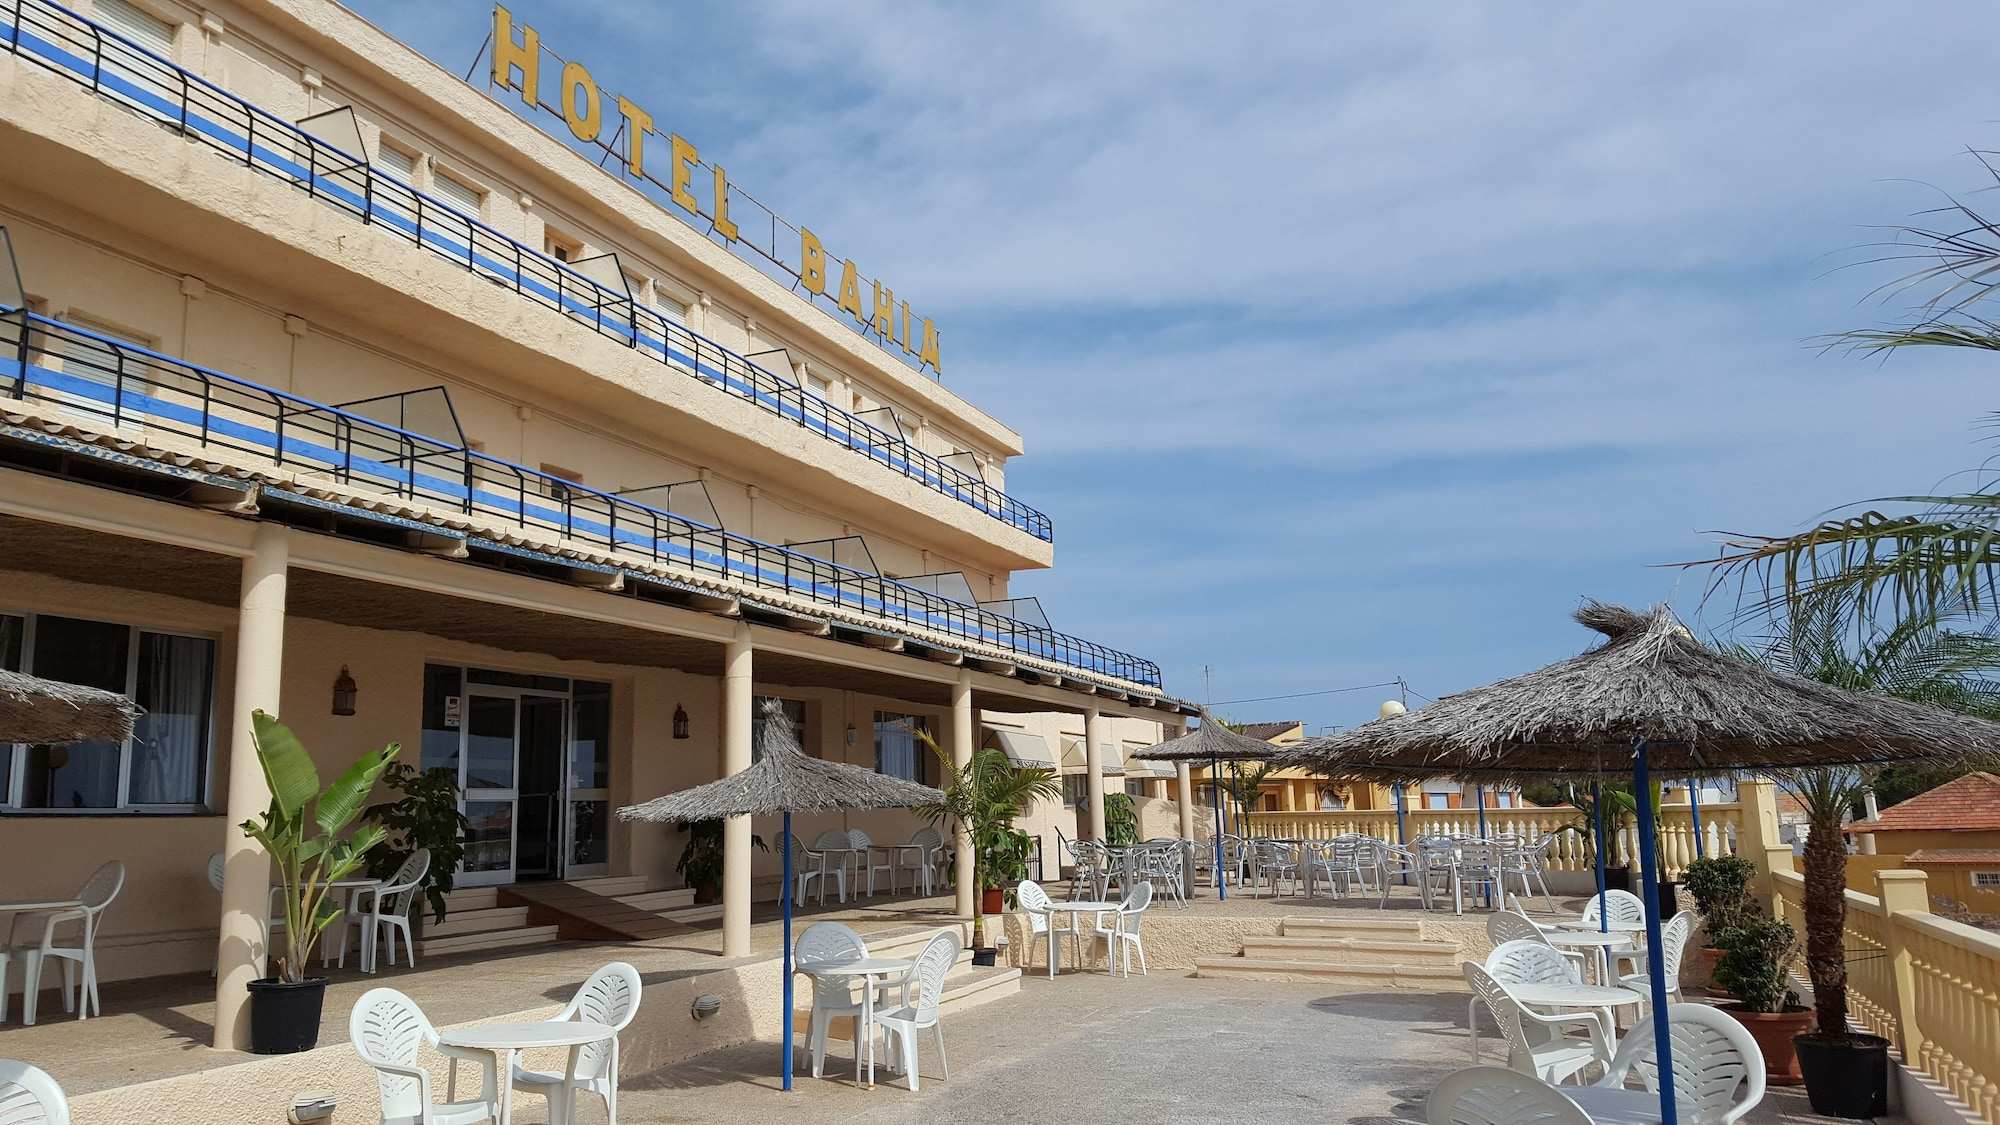 Hotel Bahia, Murcia